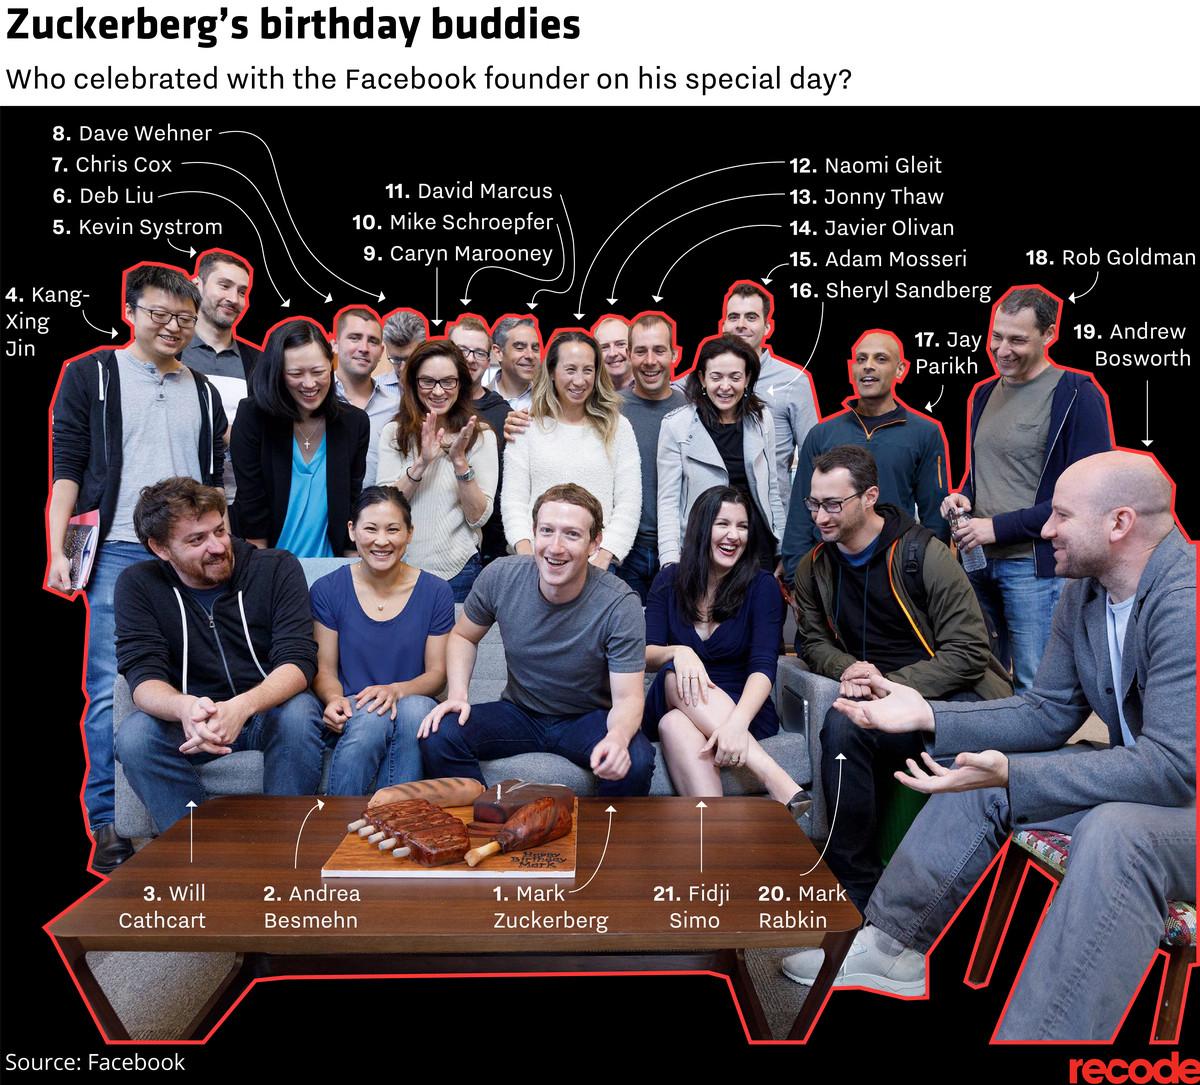 Mark Zuckerberg's birthday buddies